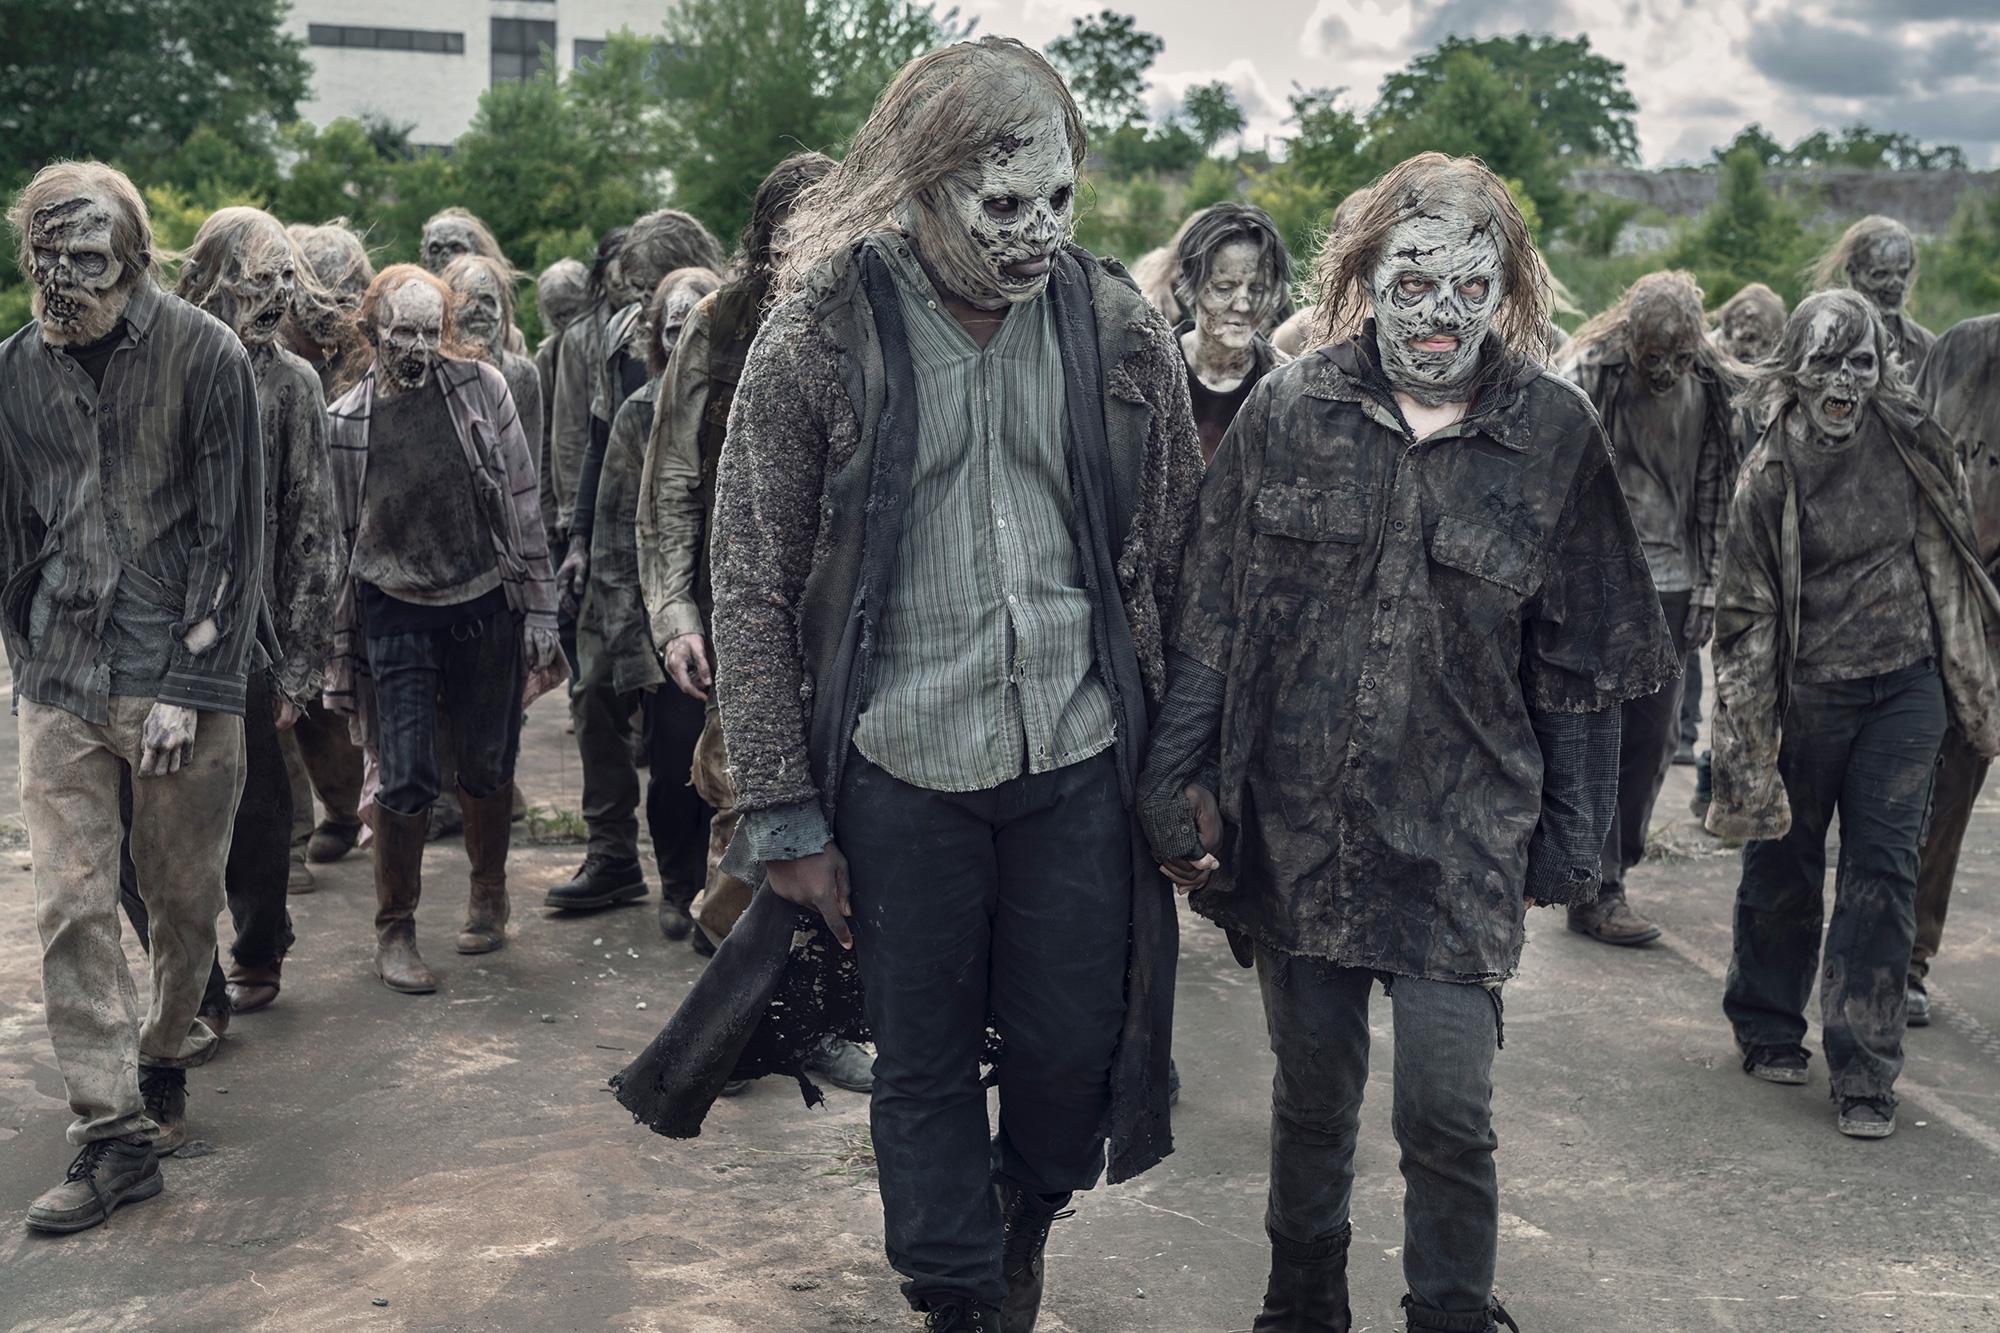 Lauren Cohan as Maggie Rhee, Okea Eme-Akwari as Elijah The Walking Dead Season 11, Episode 7